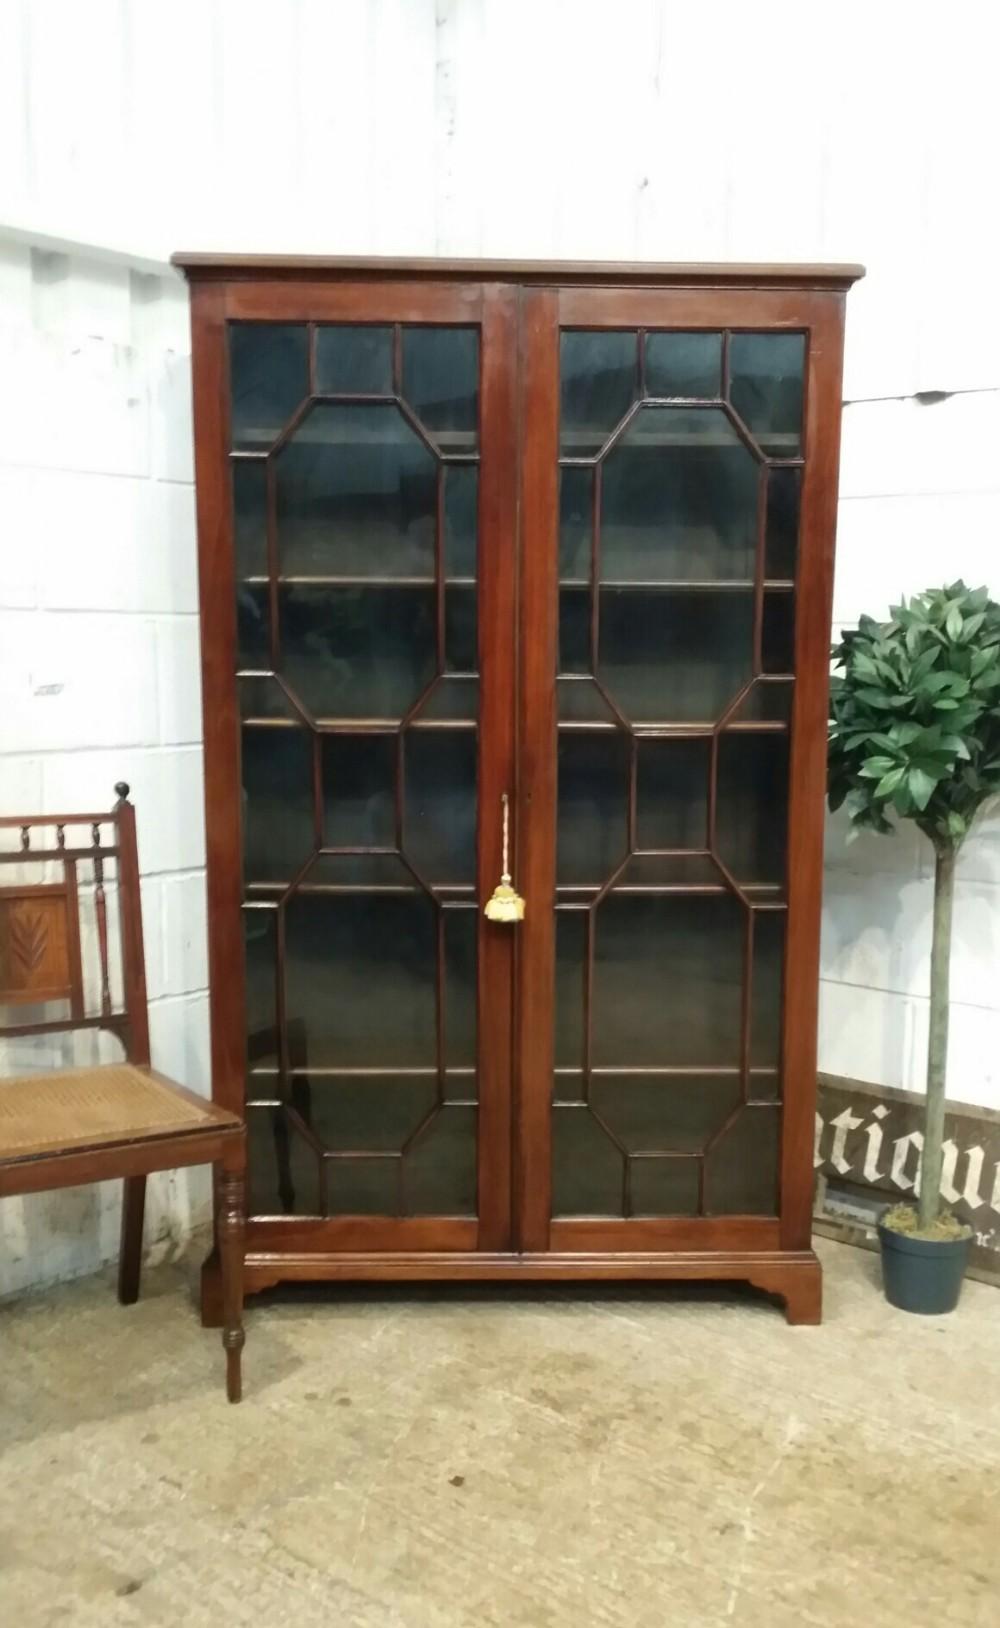 antique regency mahogany astragal glazed bookcase c1820